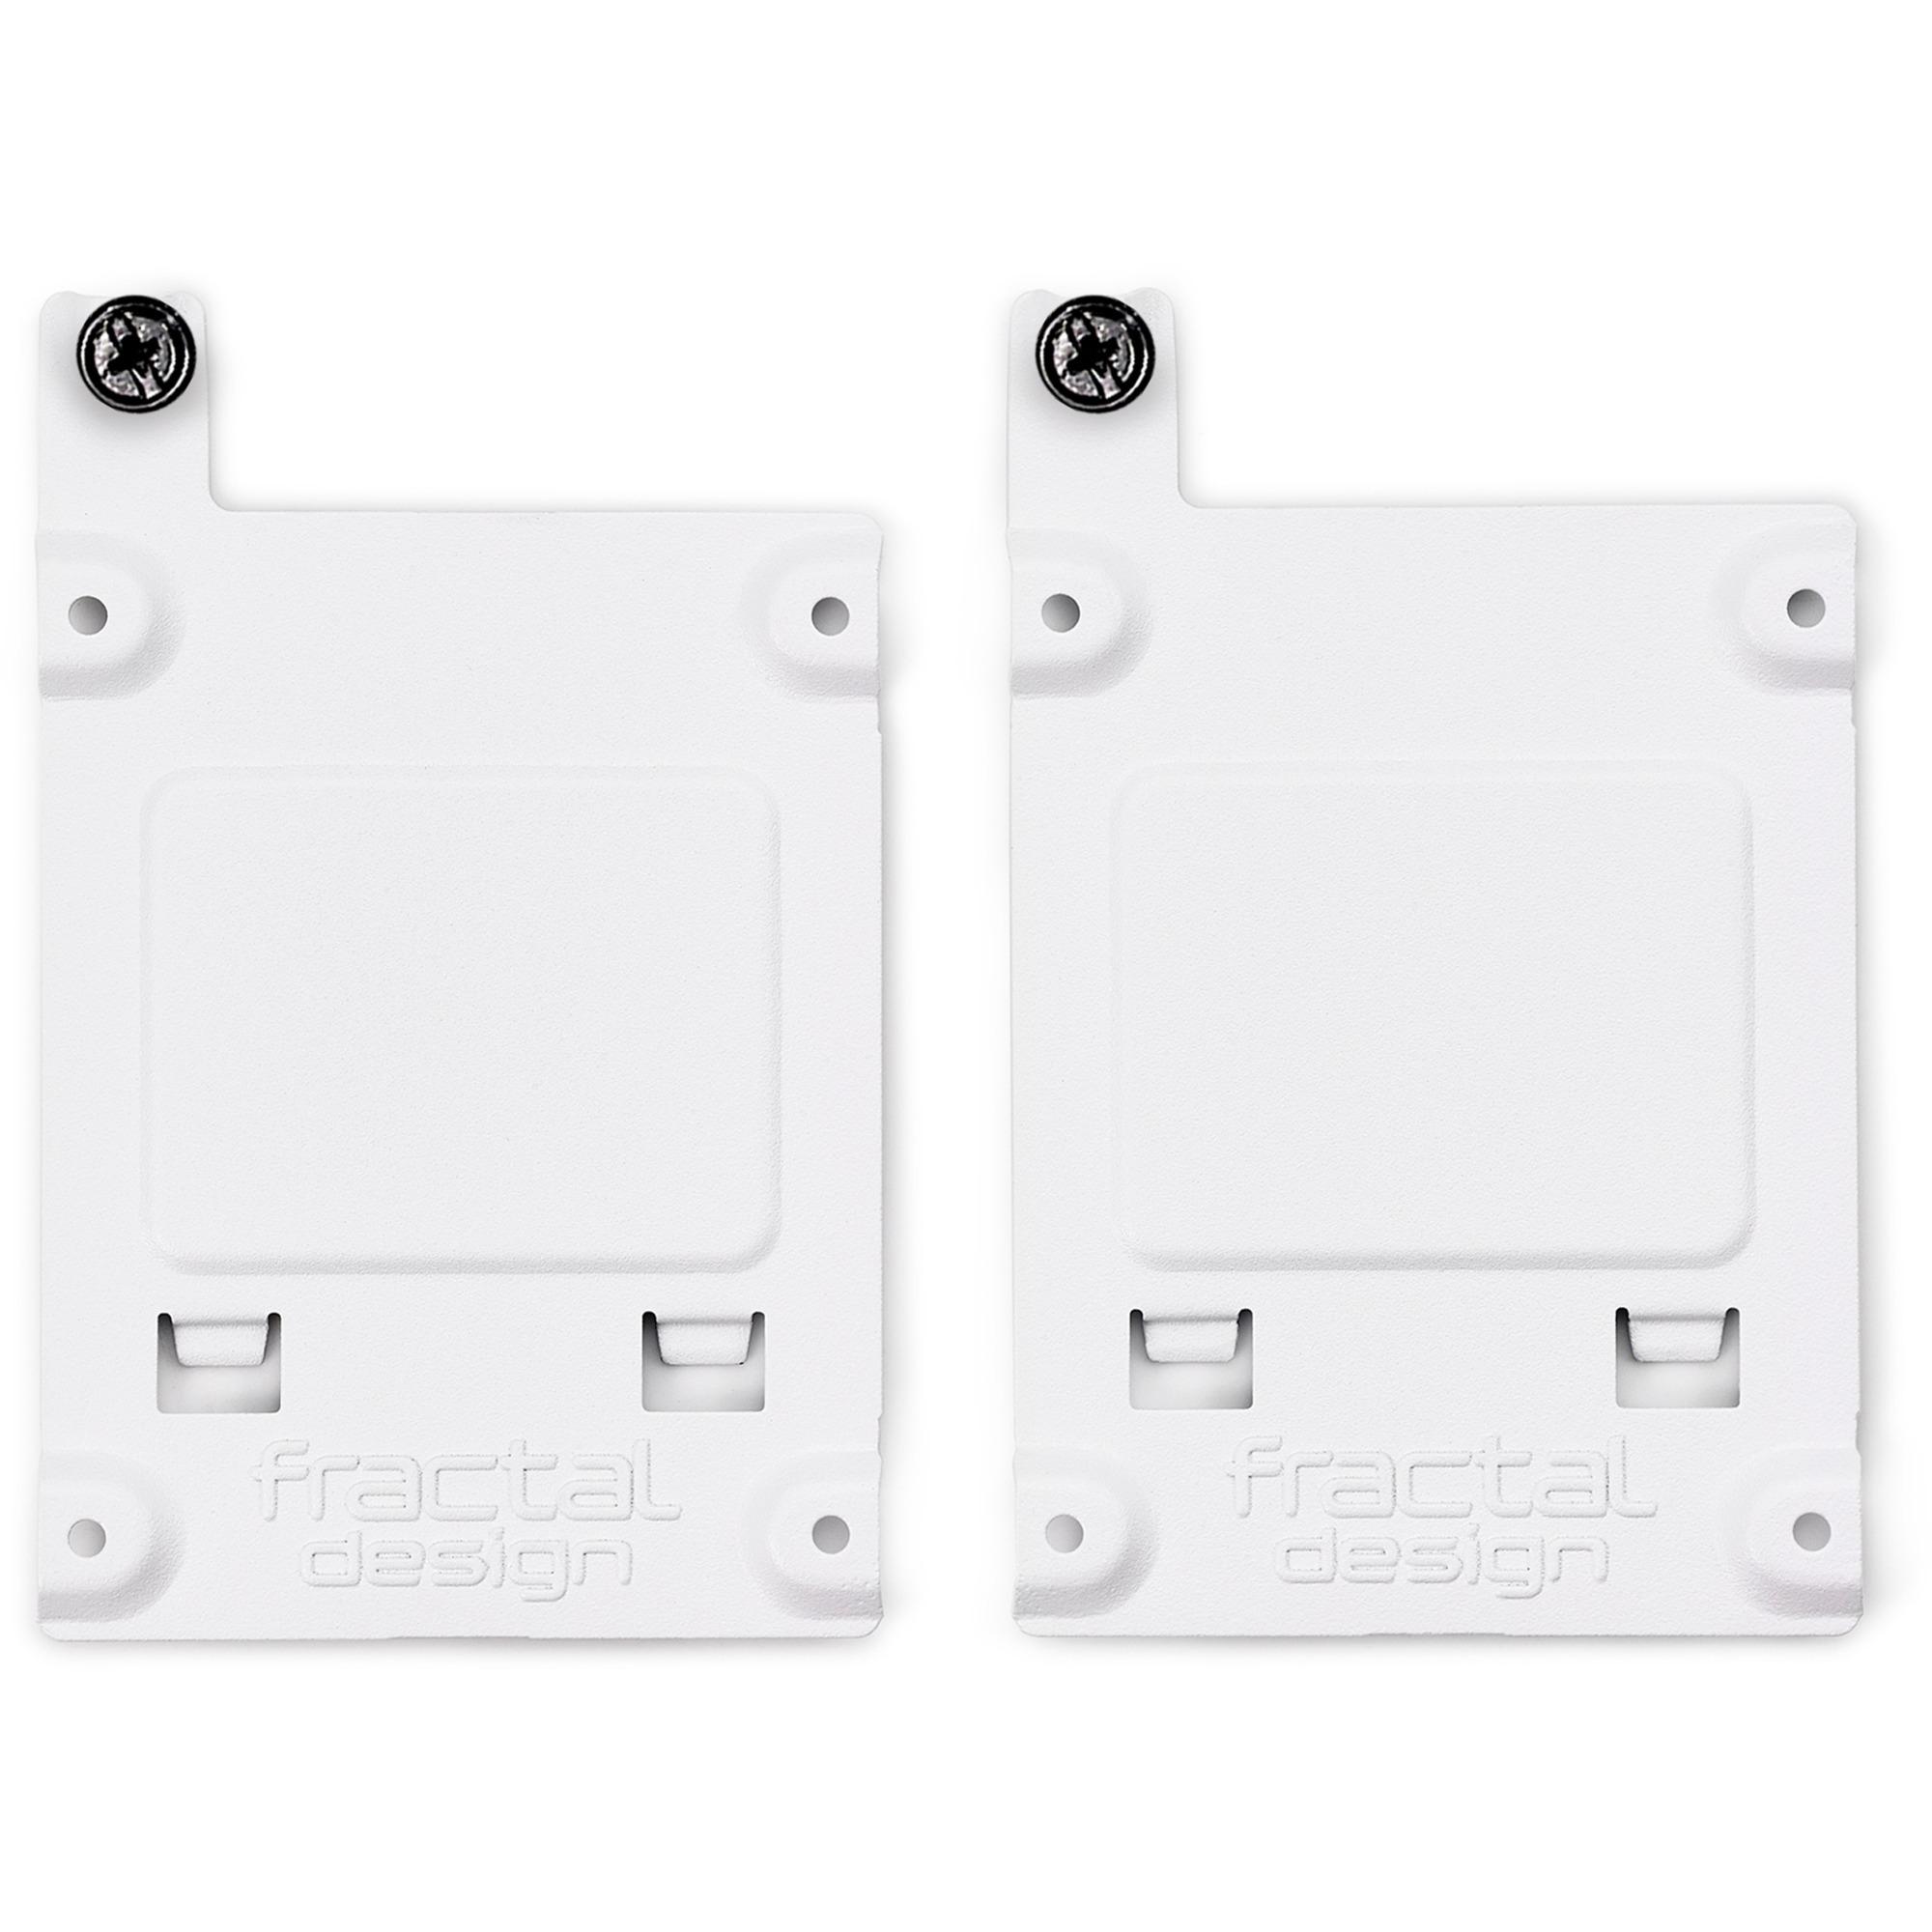 FD-ACC-SSD-A-WT-2P parte carcasa de ordenador Universal HDD mounting bracket, Bastidor de instalación